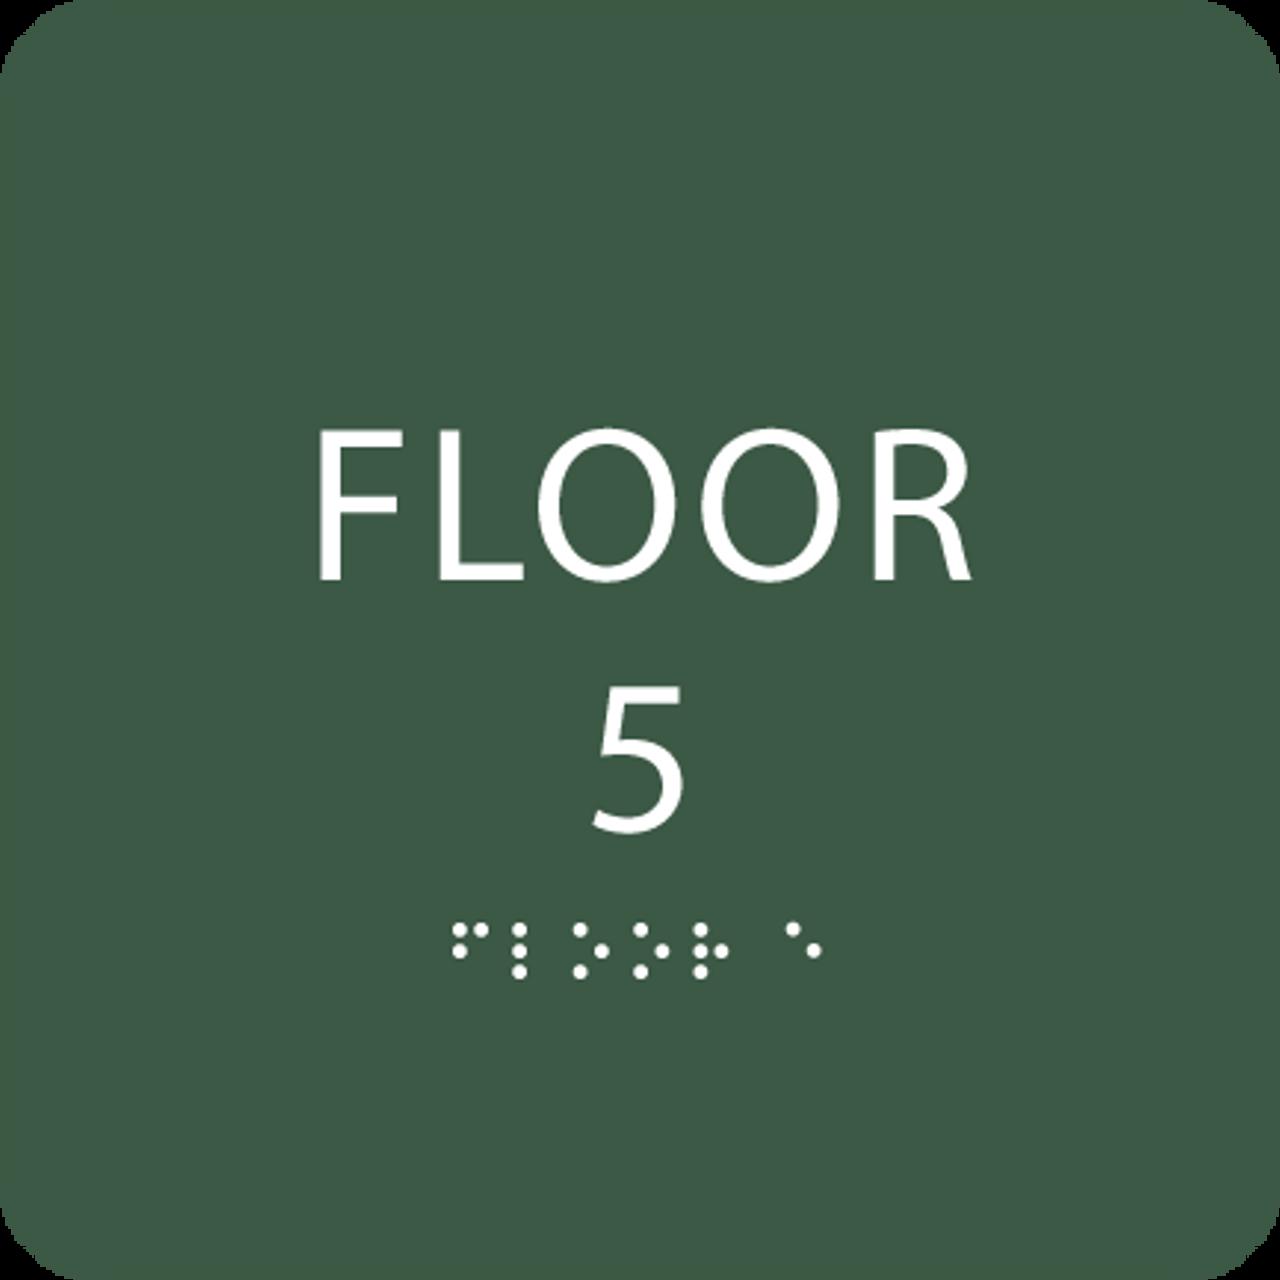 Green Floor 5 Level Number Sign